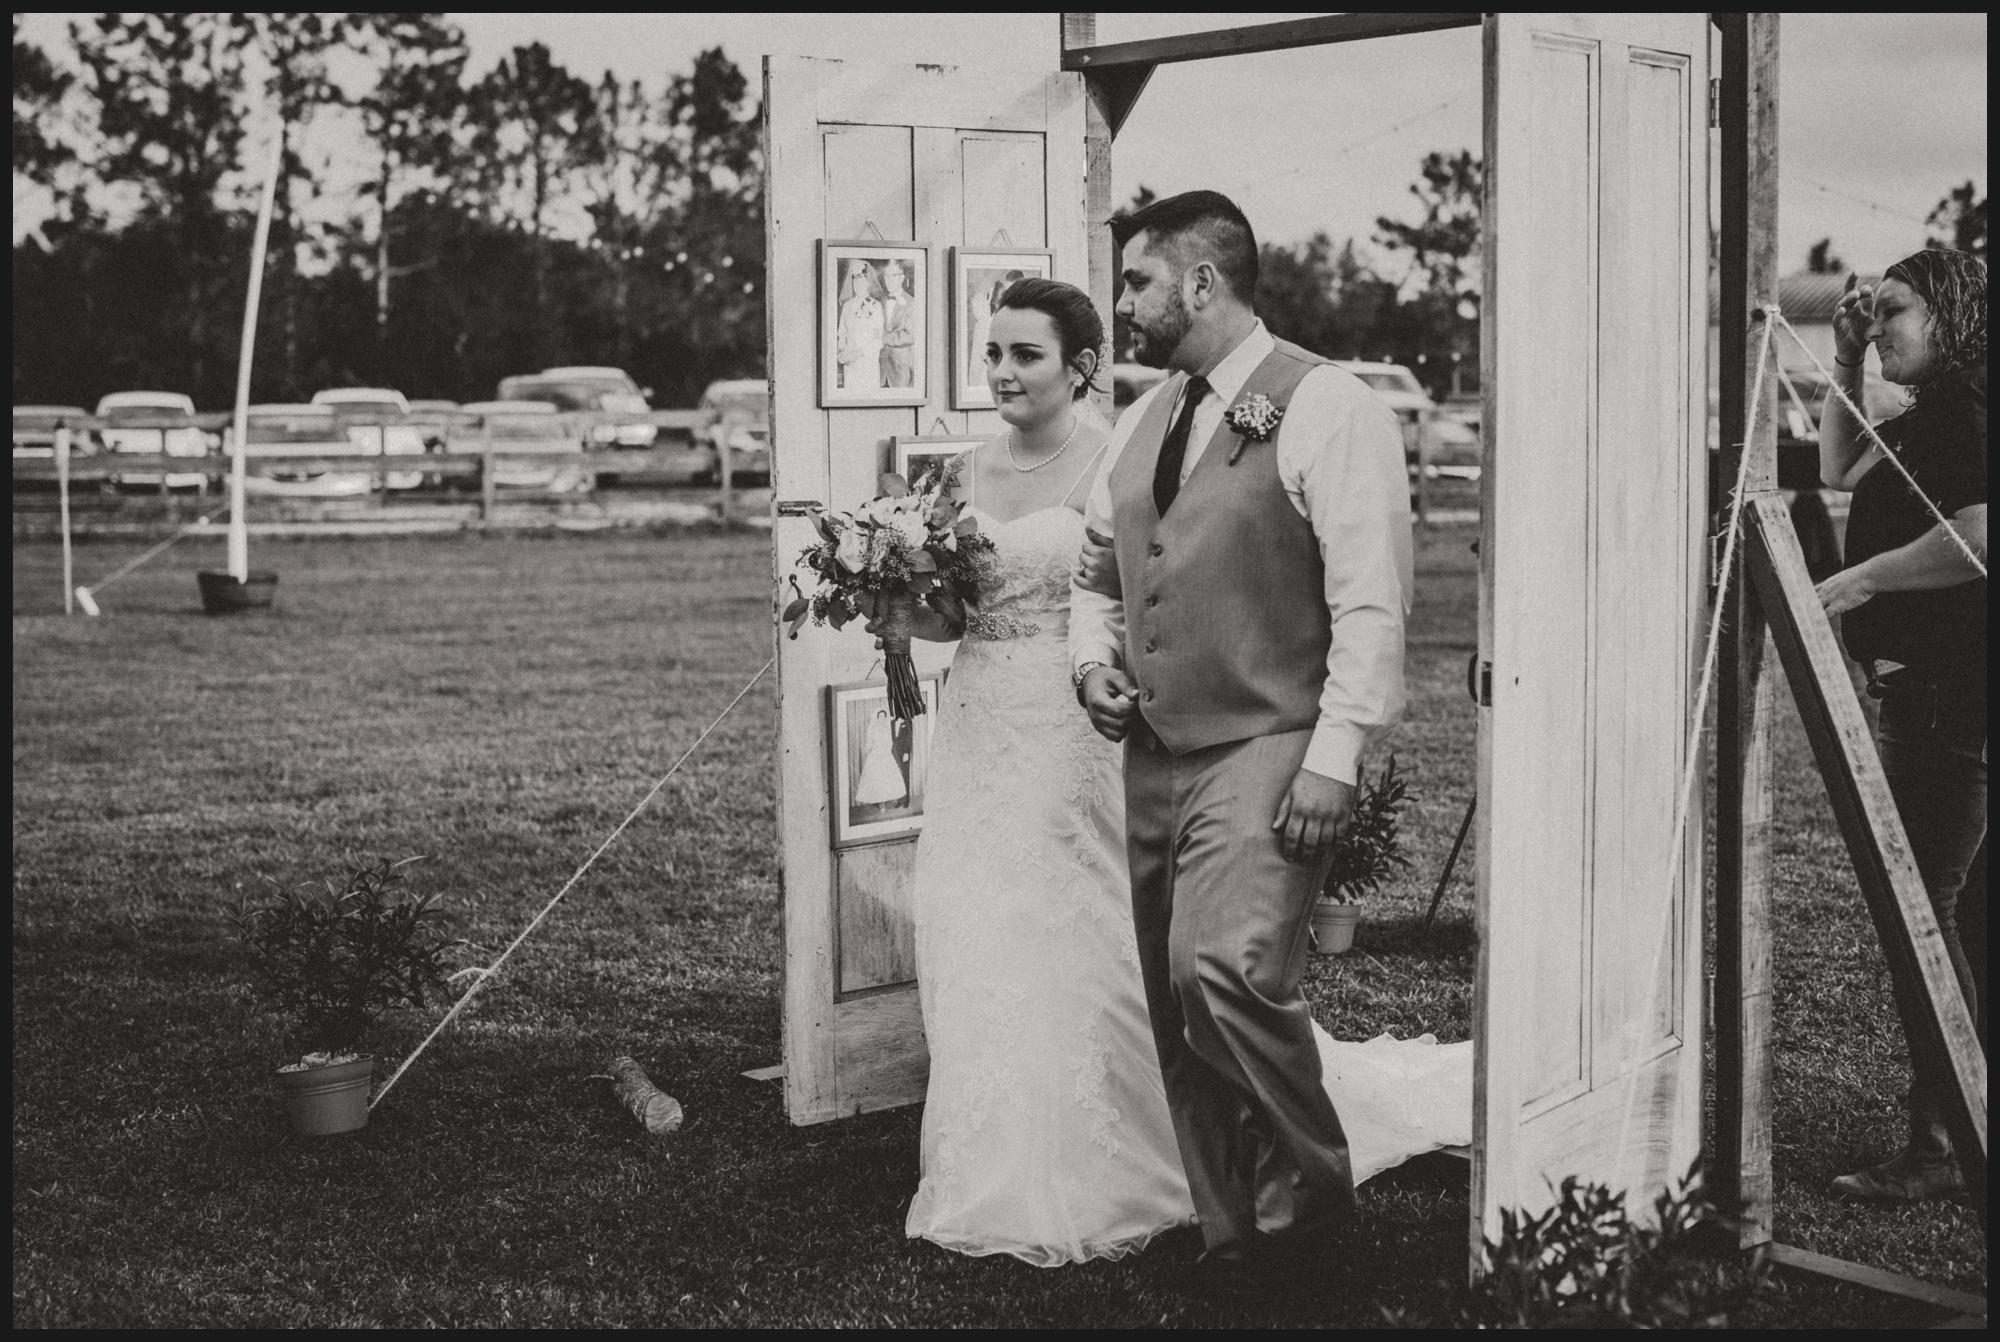 Orlando-Wedding-Photographer-destination-wedding-photographer-florida-wedding-photographer-bohemian-wedding-photographer_0339.jpg